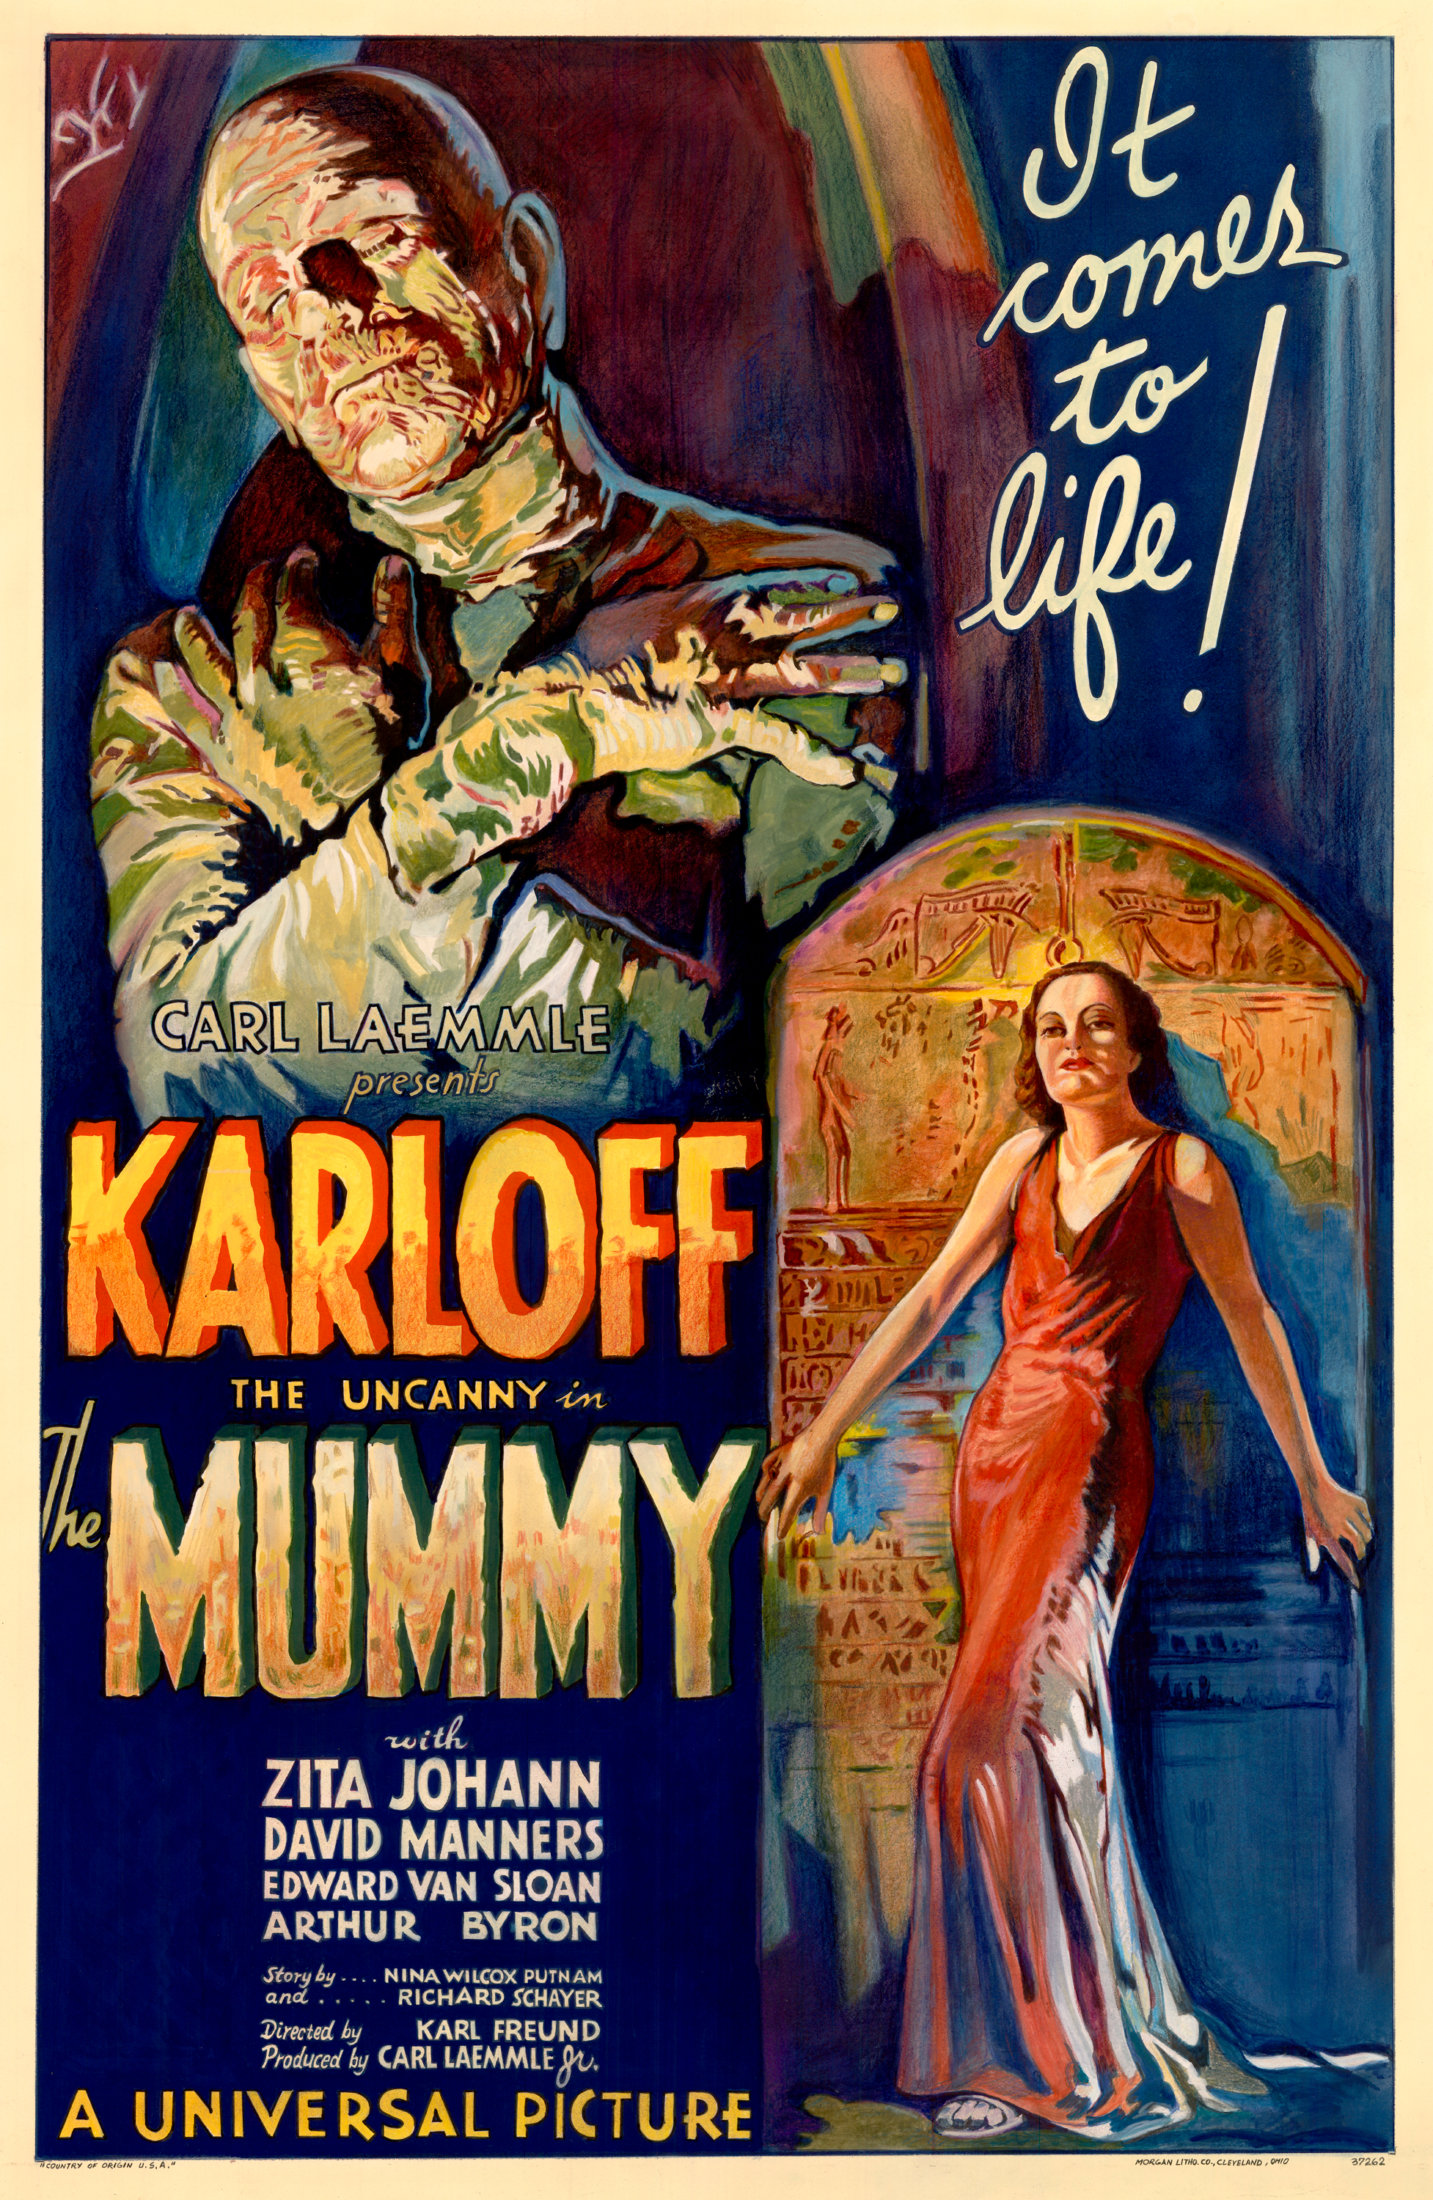 The Mummy 1932 film poster